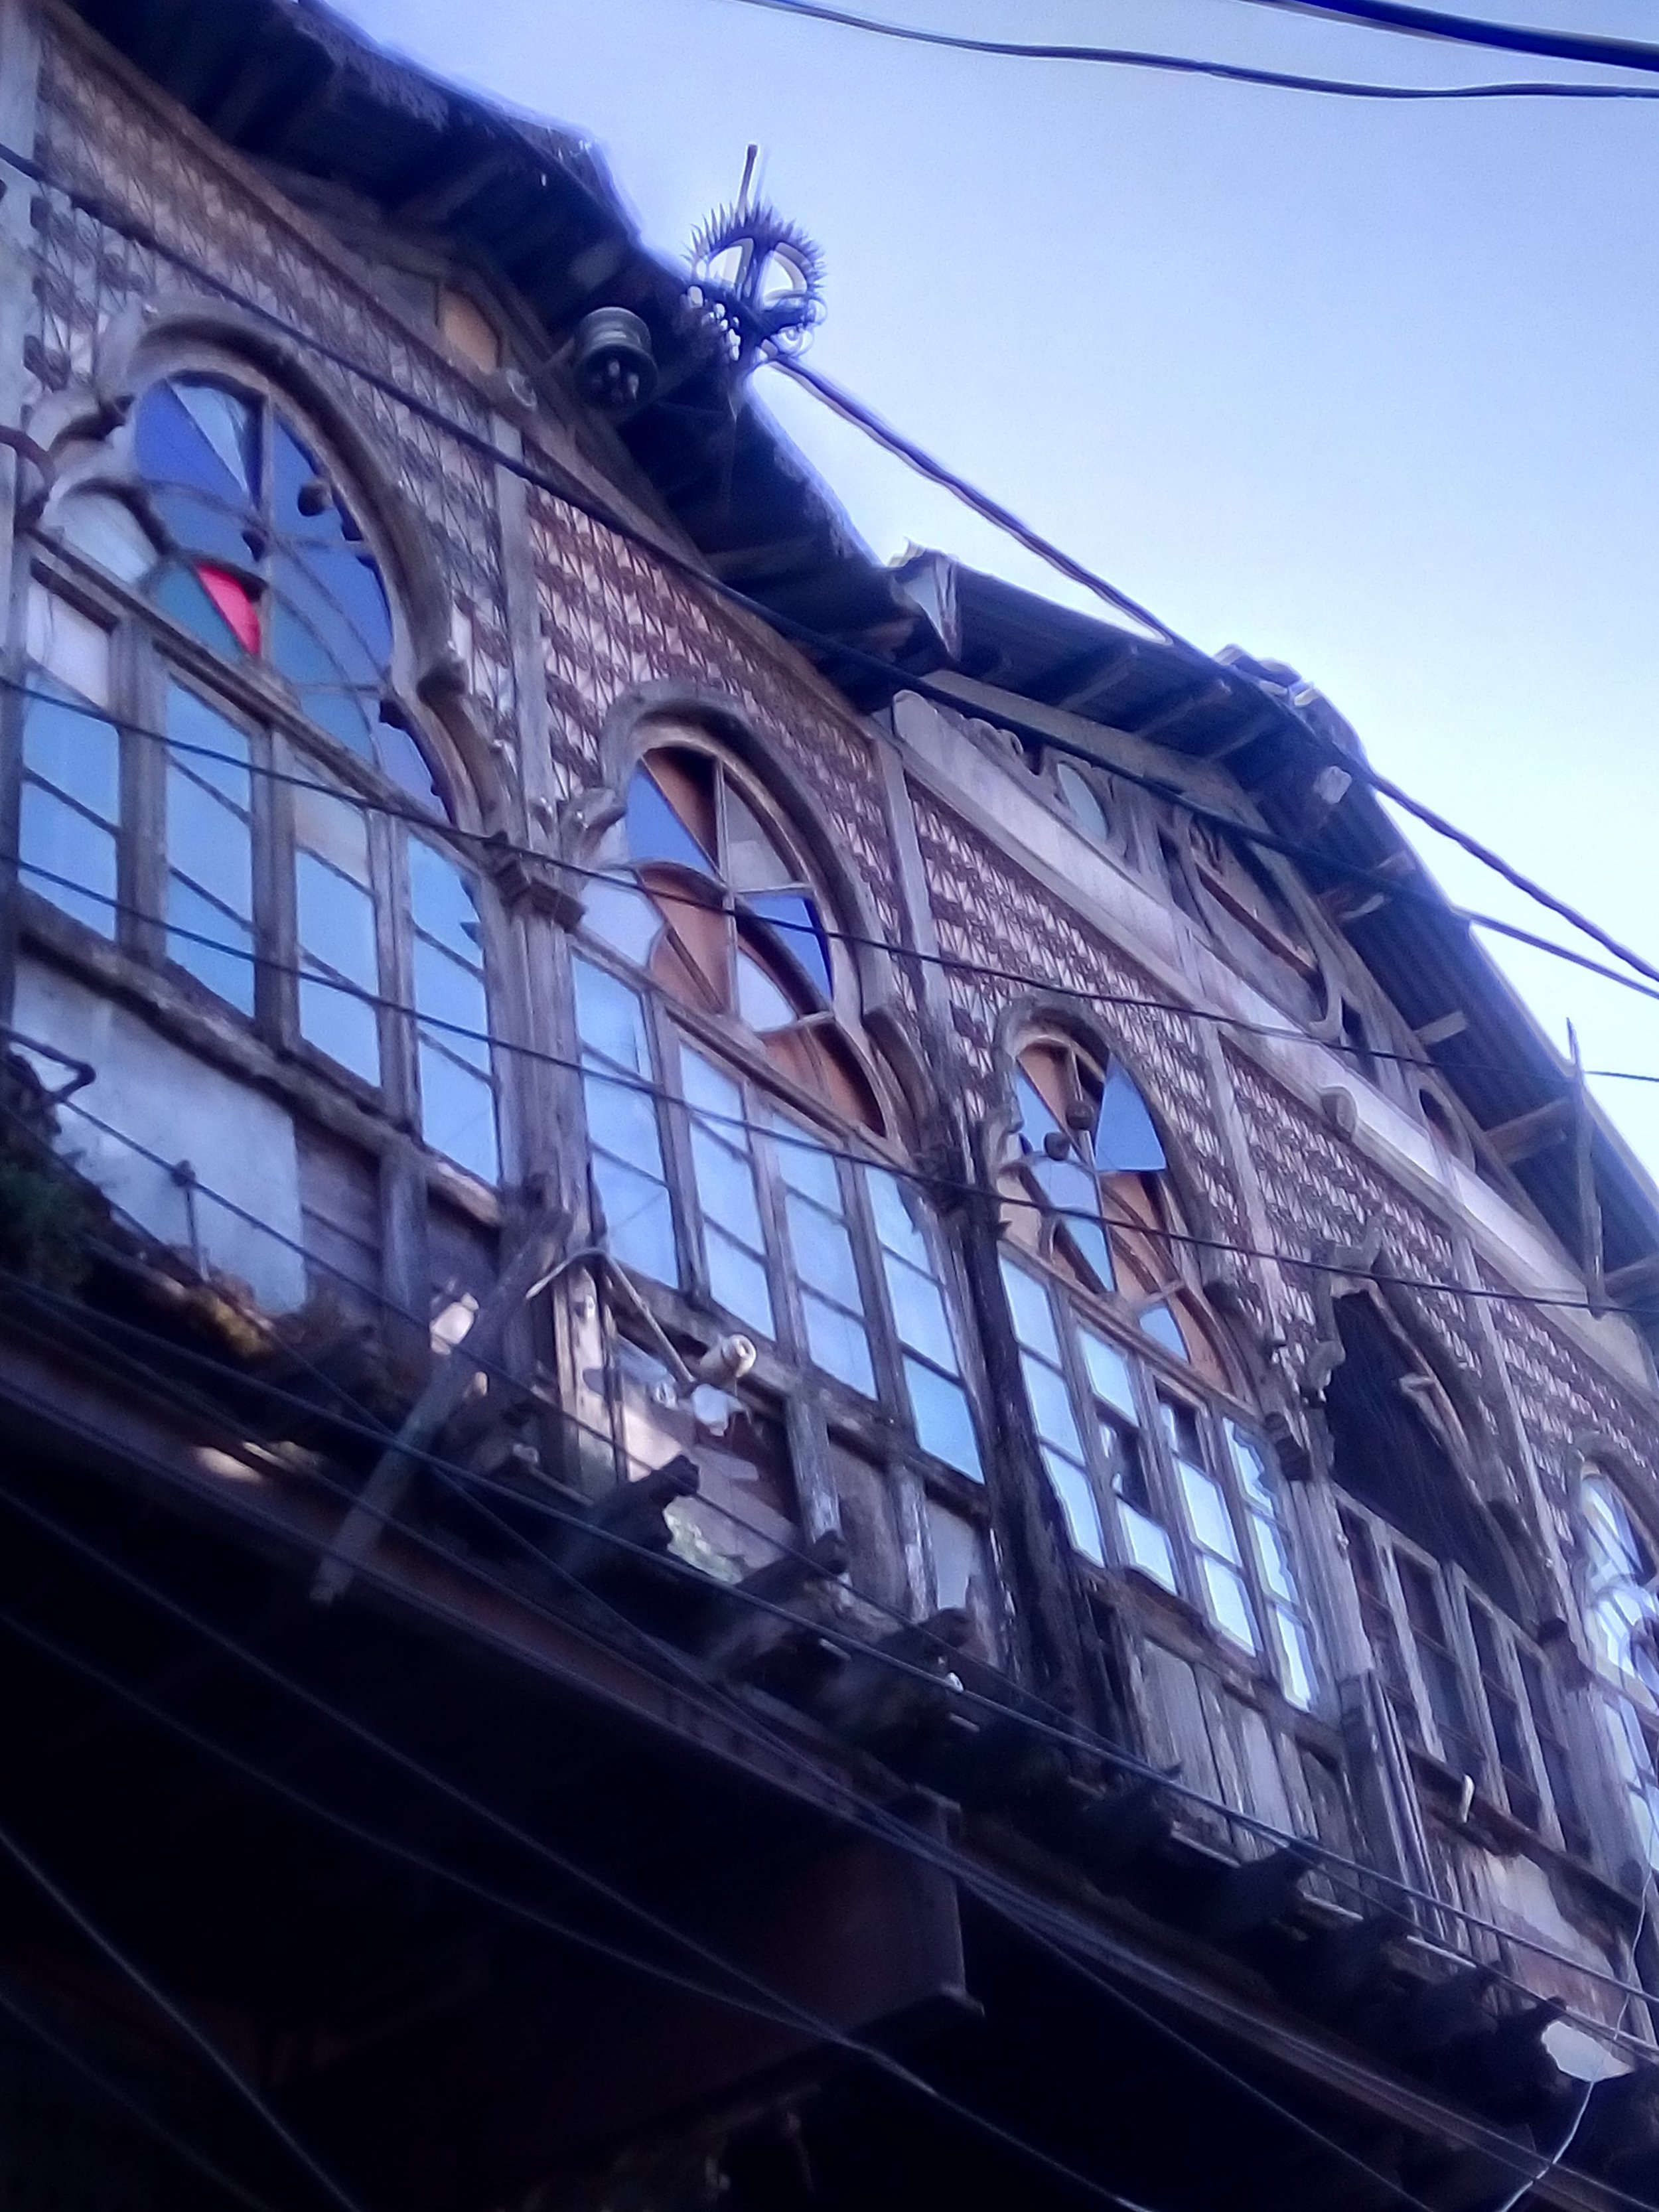 A view of the ramshackle Kohinoor building